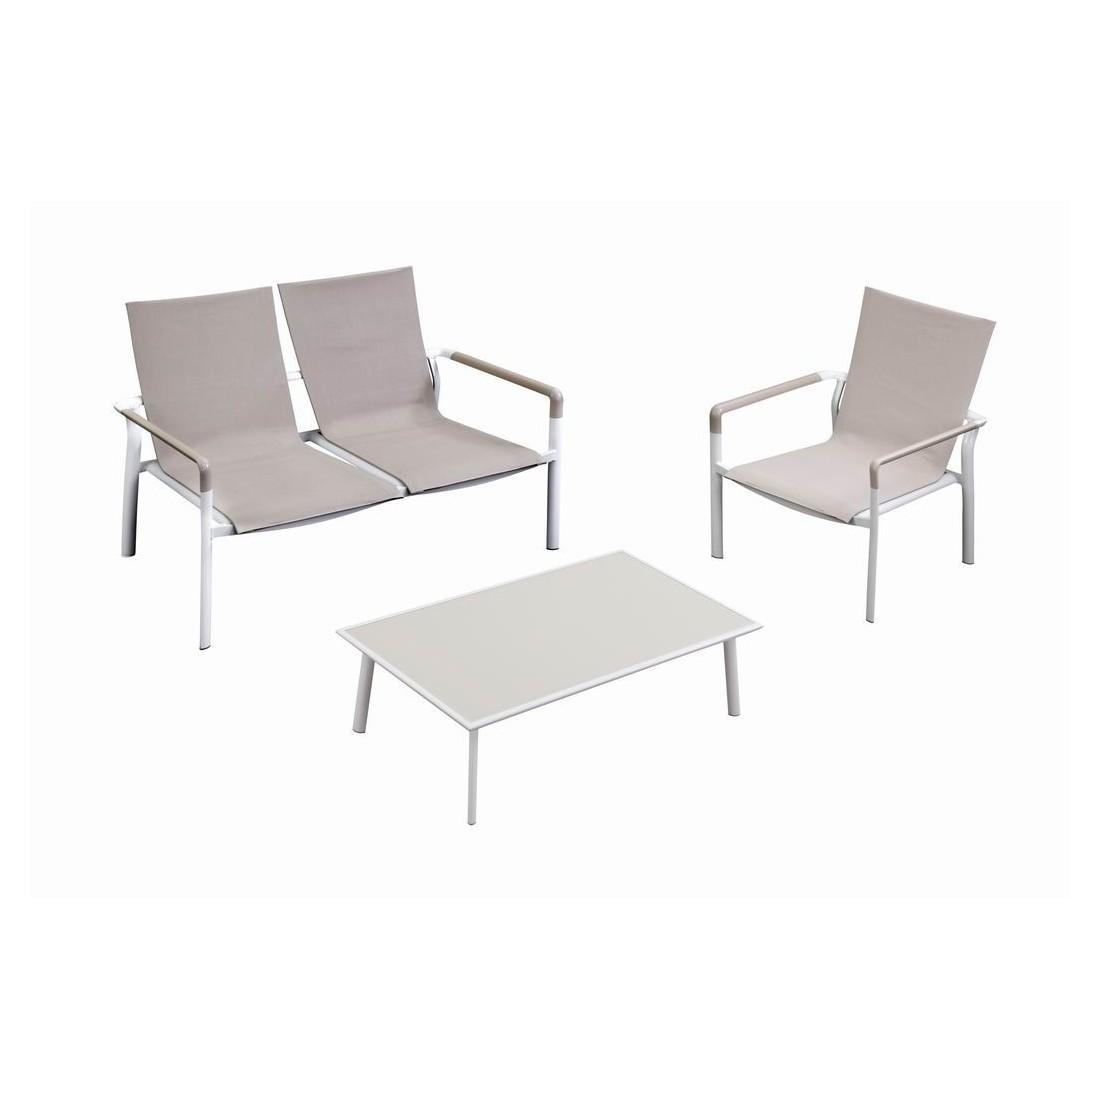 canape bas cap sud beaureal beaur al confort jardin. Black Bedroom Furniture Sets. Home Design Ideas